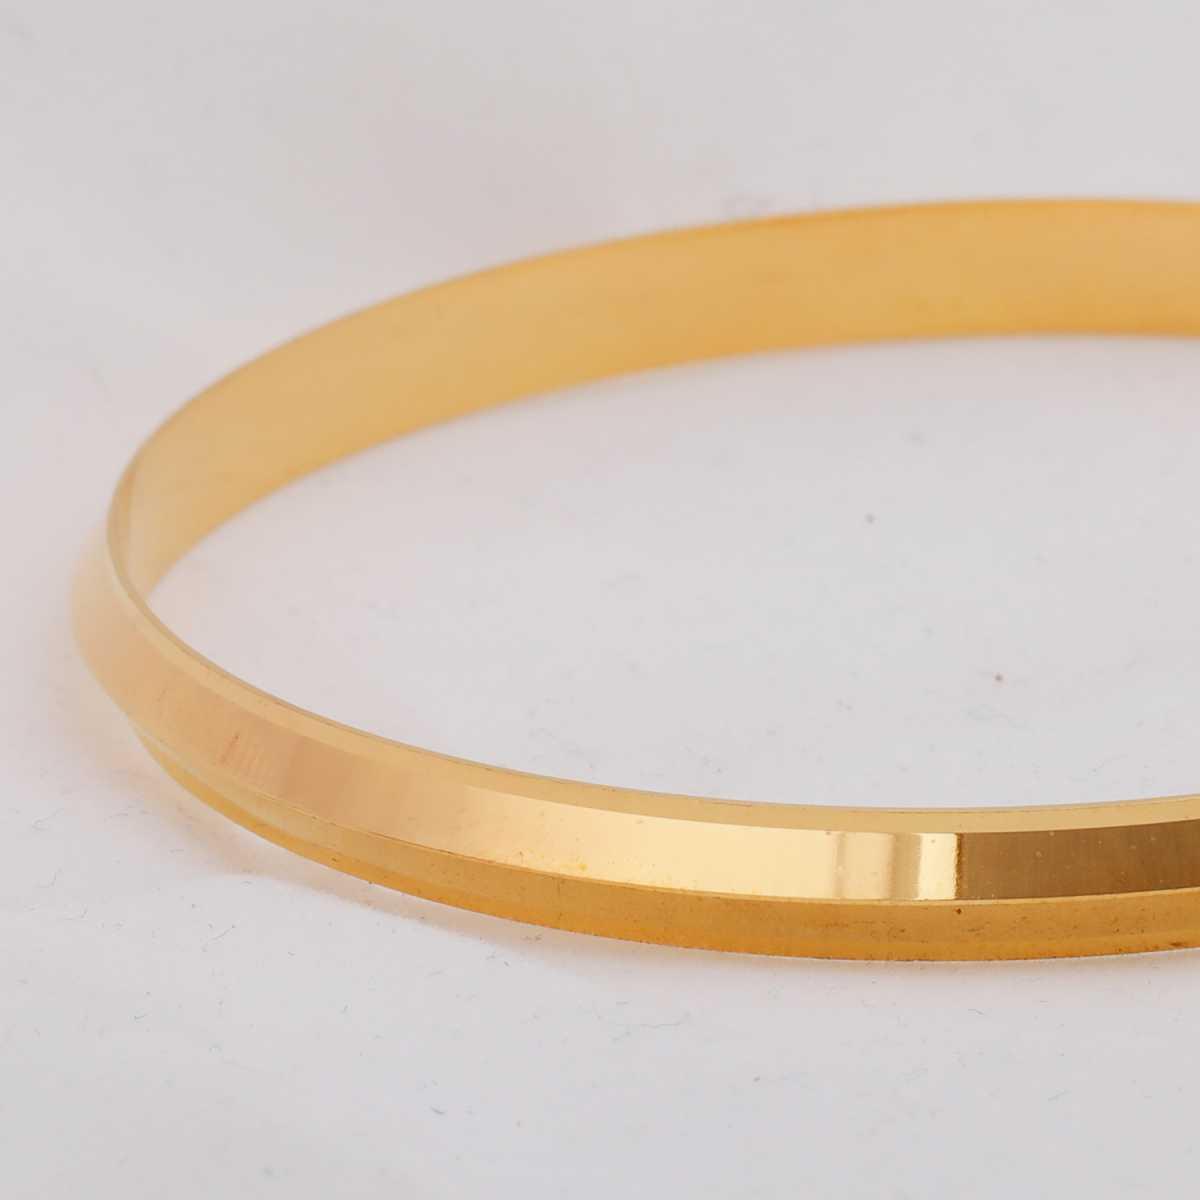 Silver Shine Gold Plated Metal Thick Punjabi Kada Bangle Bracelet For Boys and Mens.